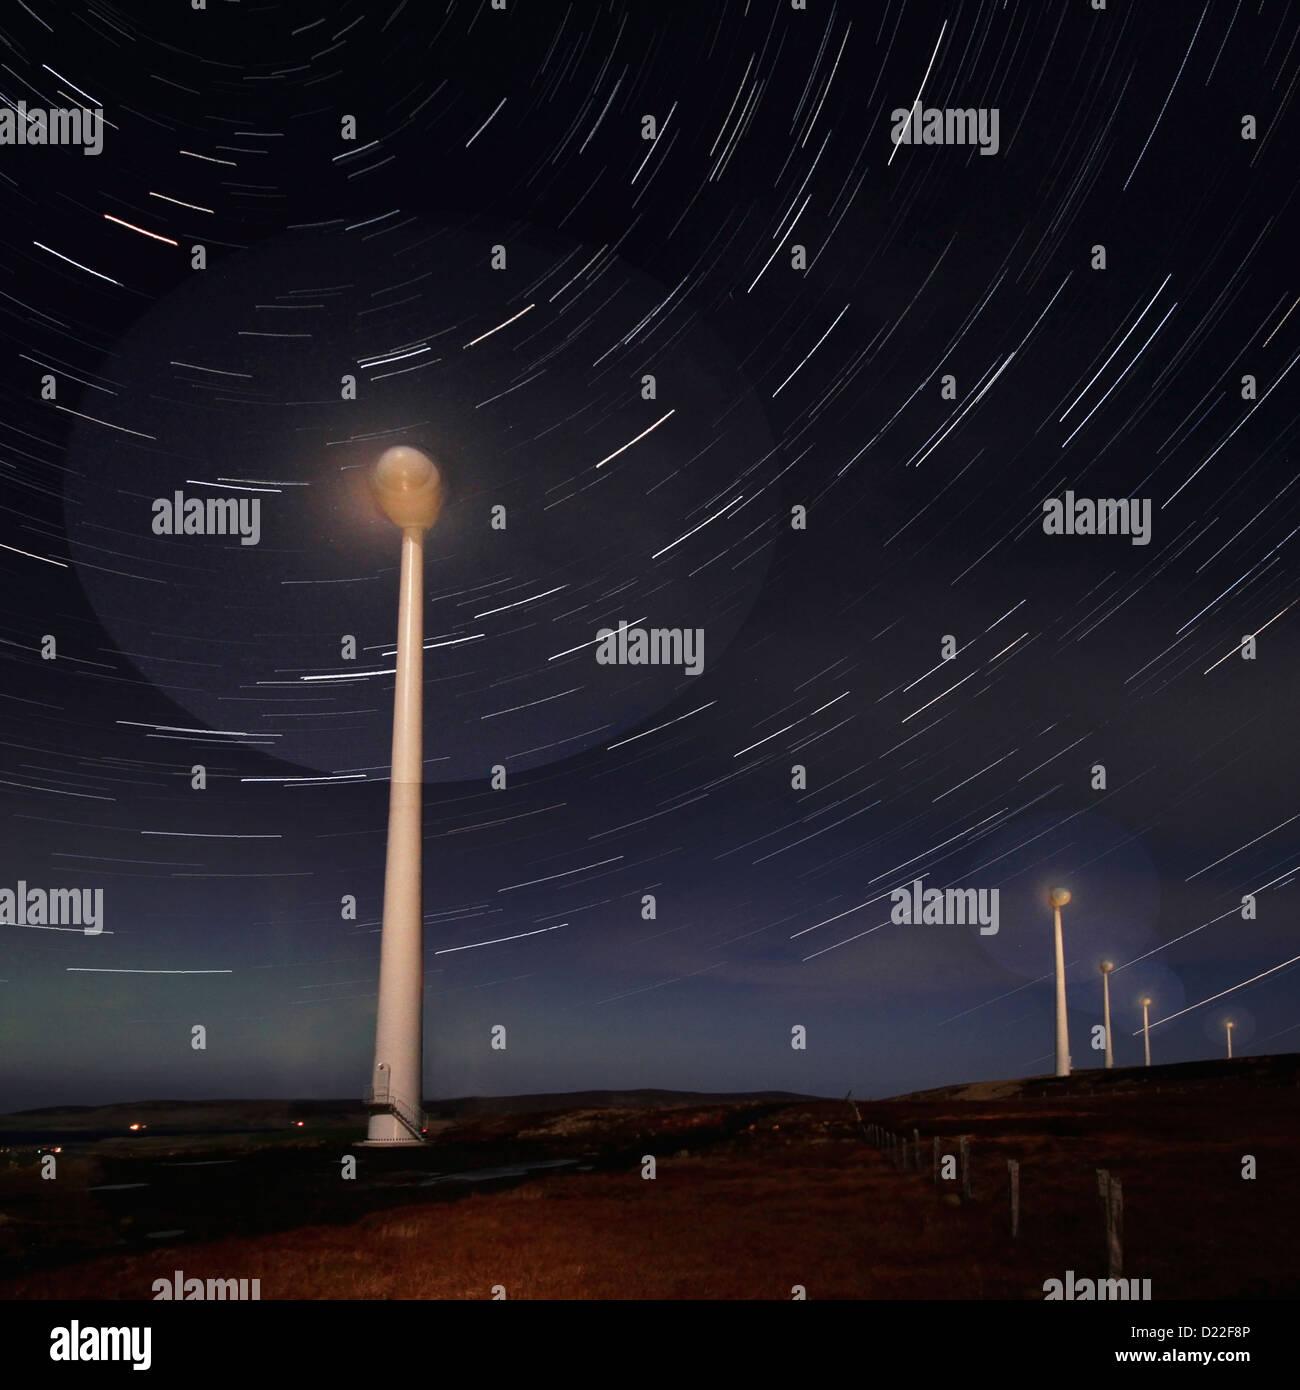 Hammars Hill wind farm at night, Orkney isles - Stock Image